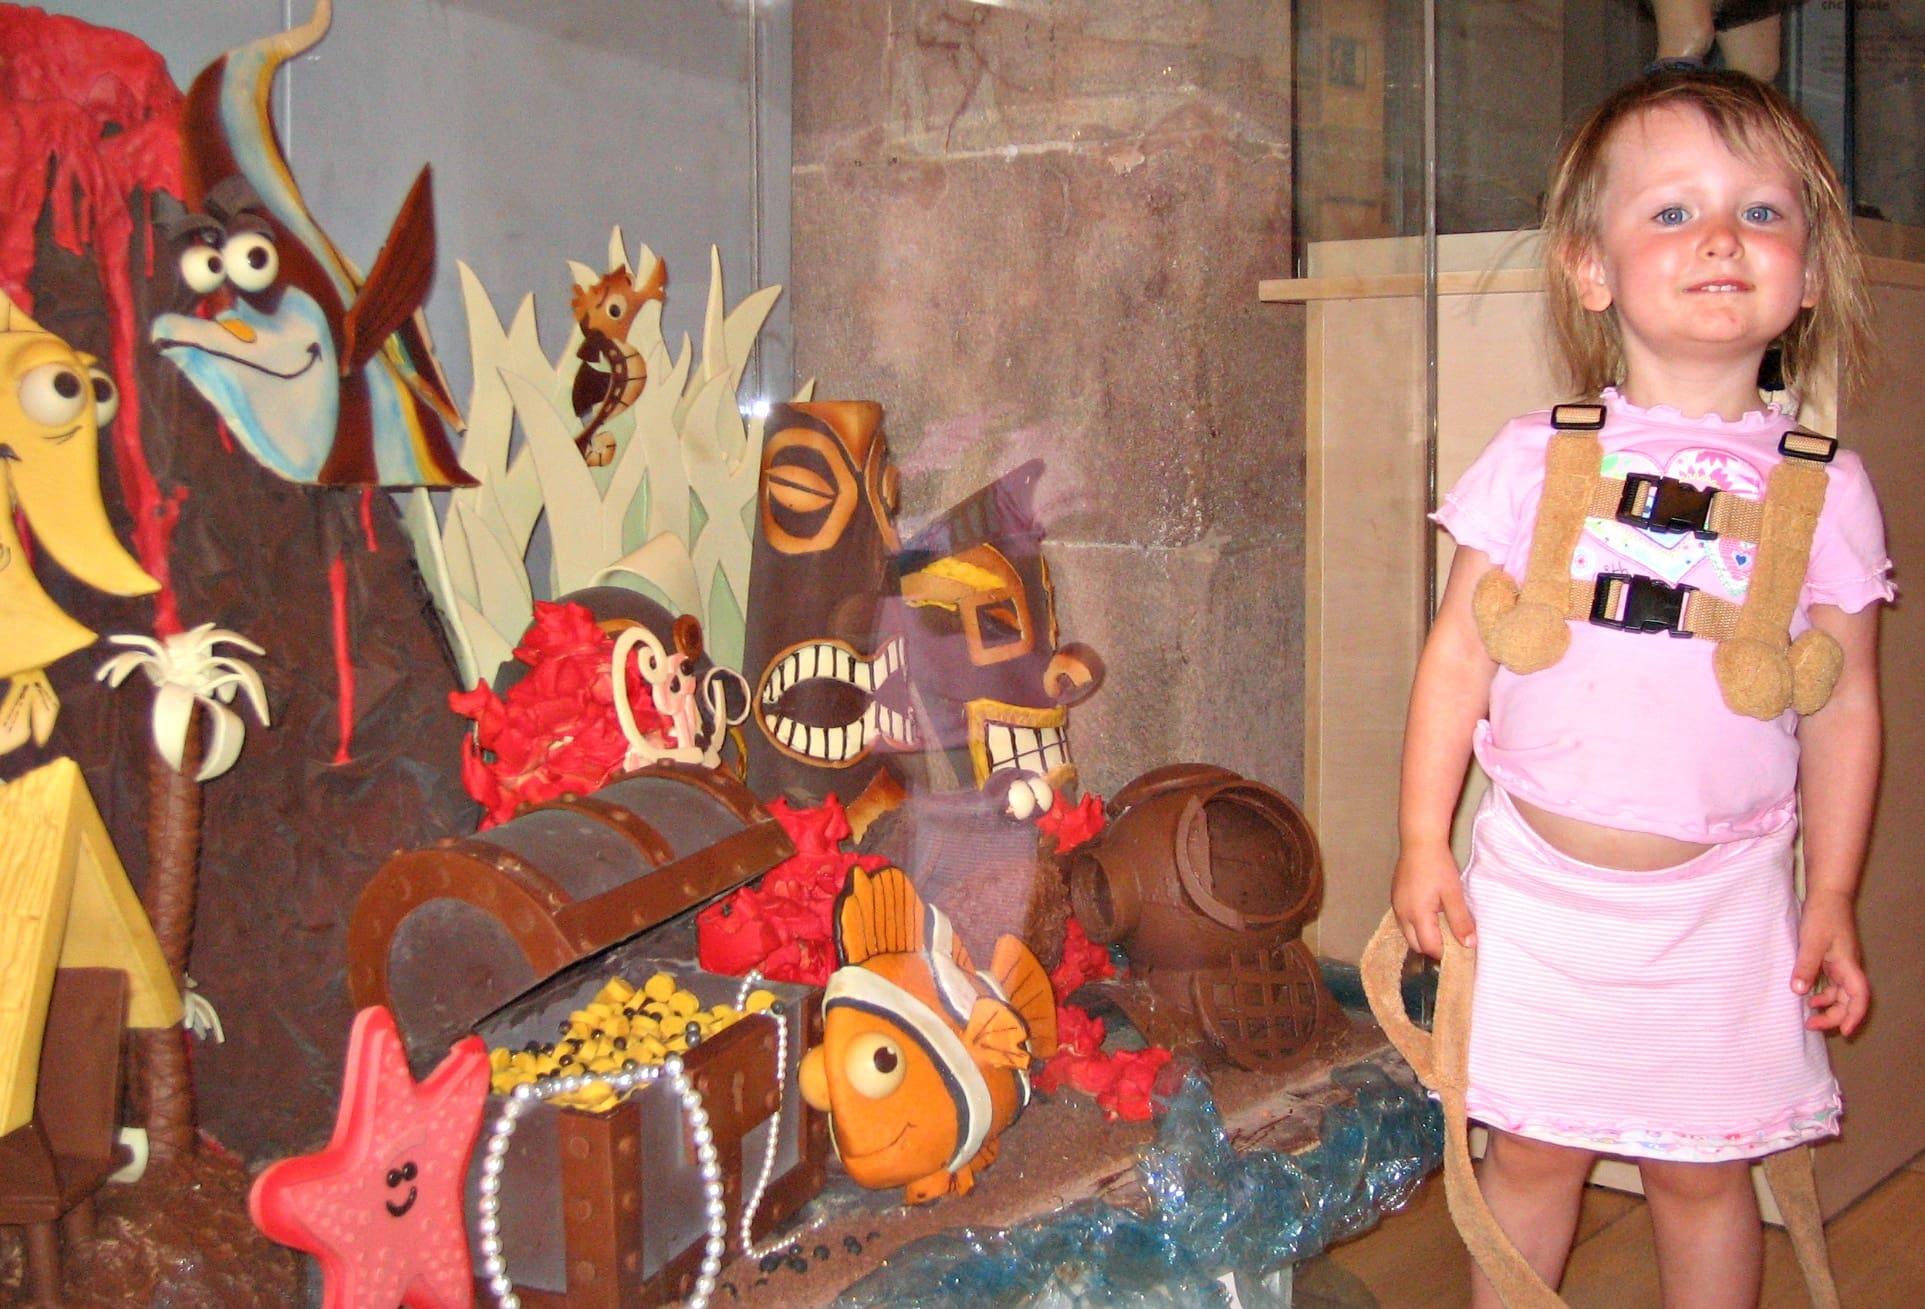 Museu de la Xocolata in Barcelona with kids